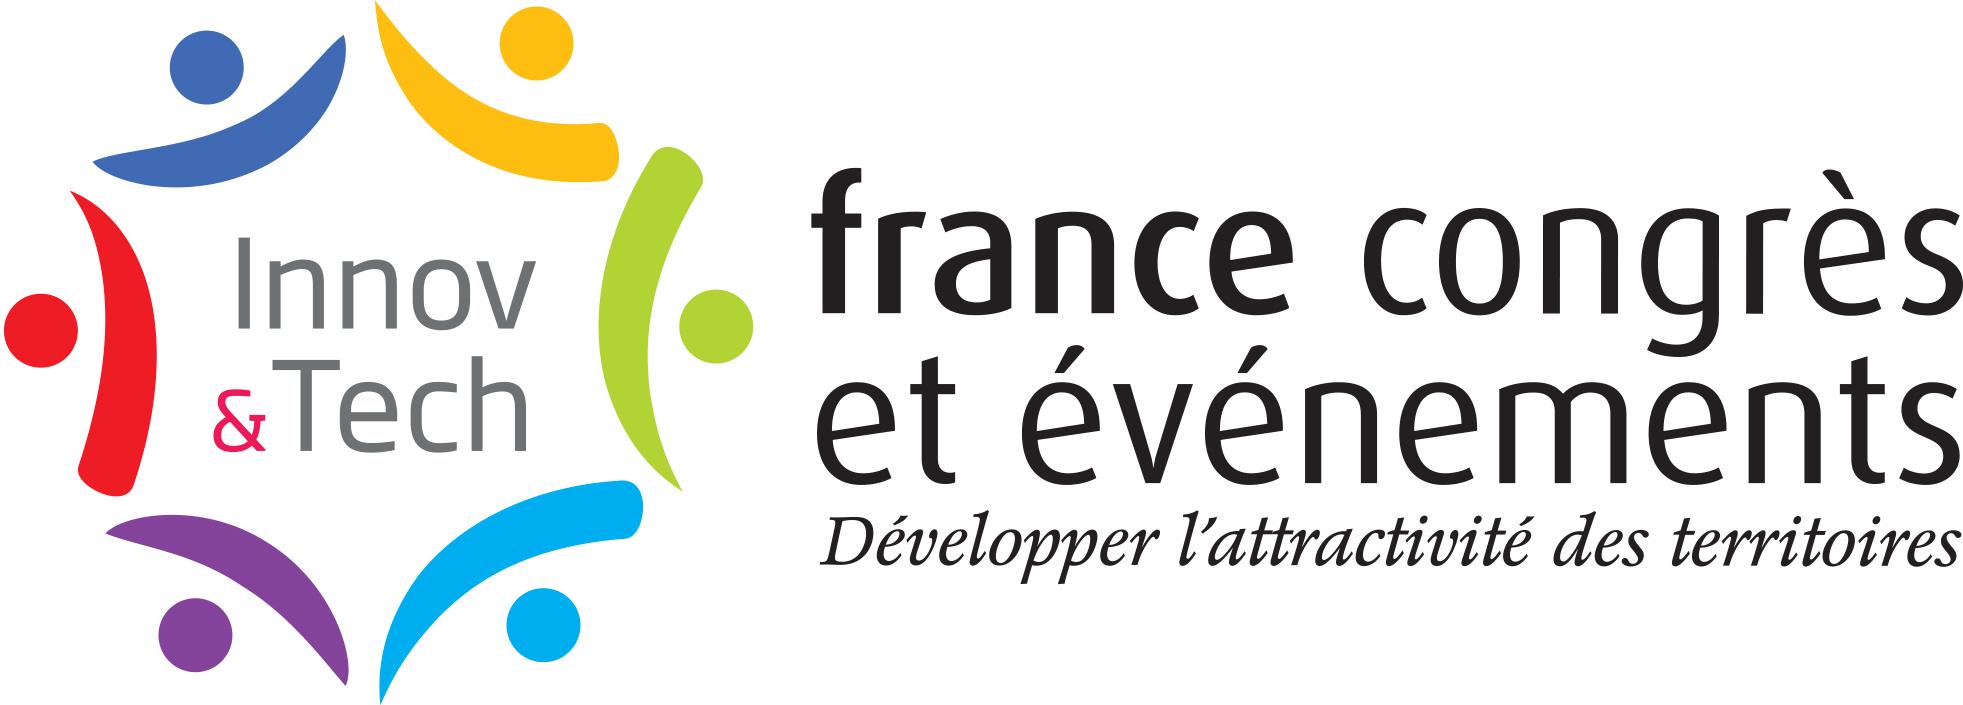 Francecongresnouveaulogo2017cmjnhorizontalinnov1530112474153011247415351037861535103786